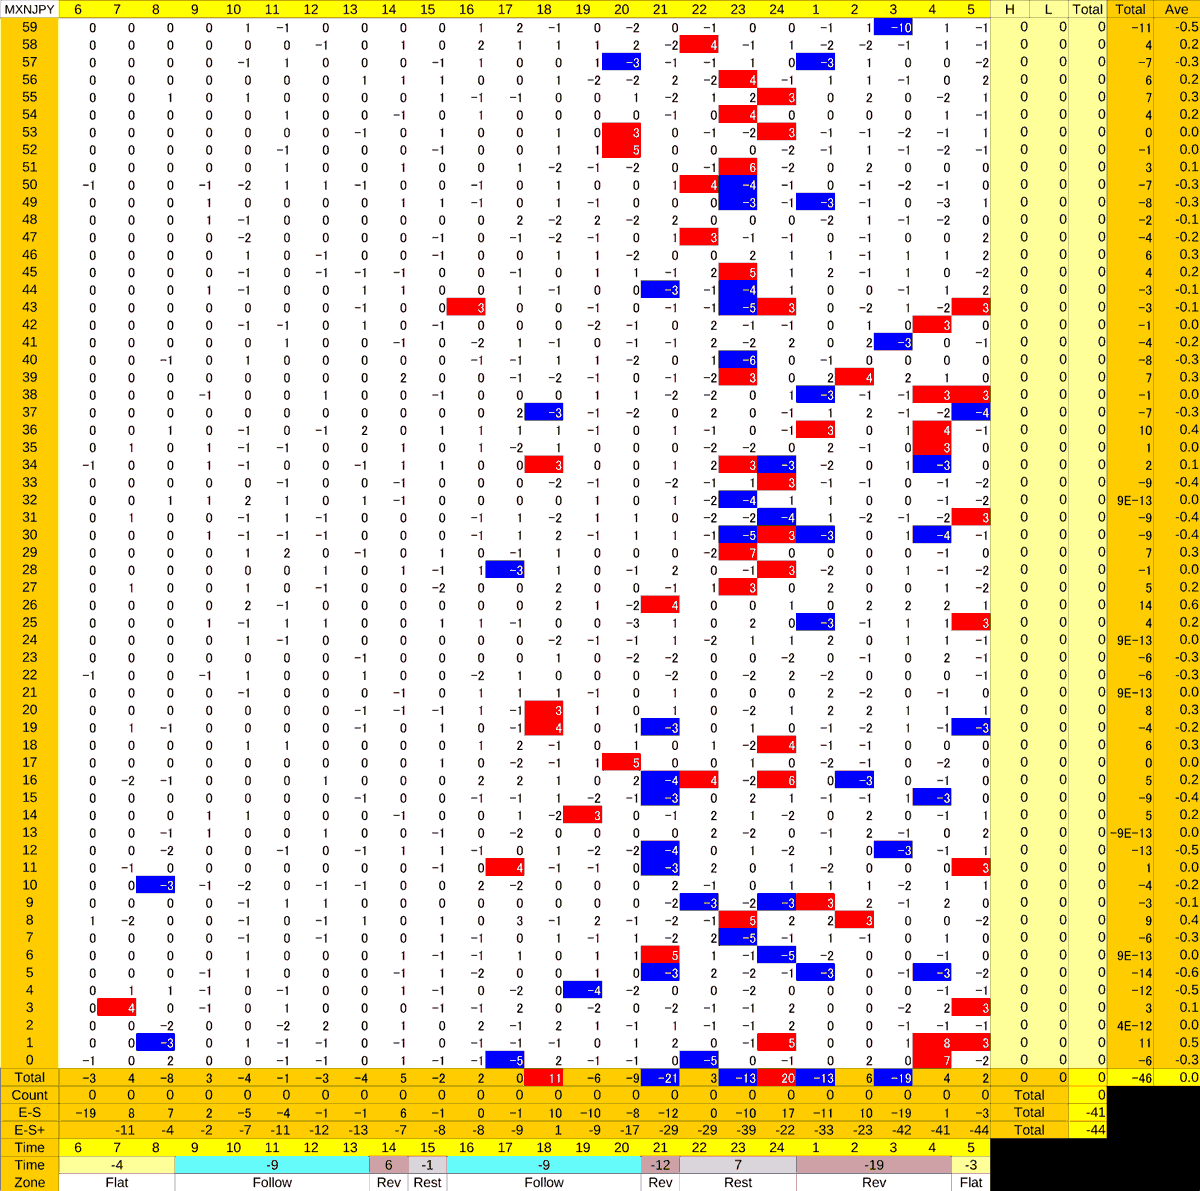 20210127_HS(3)MXNJPY